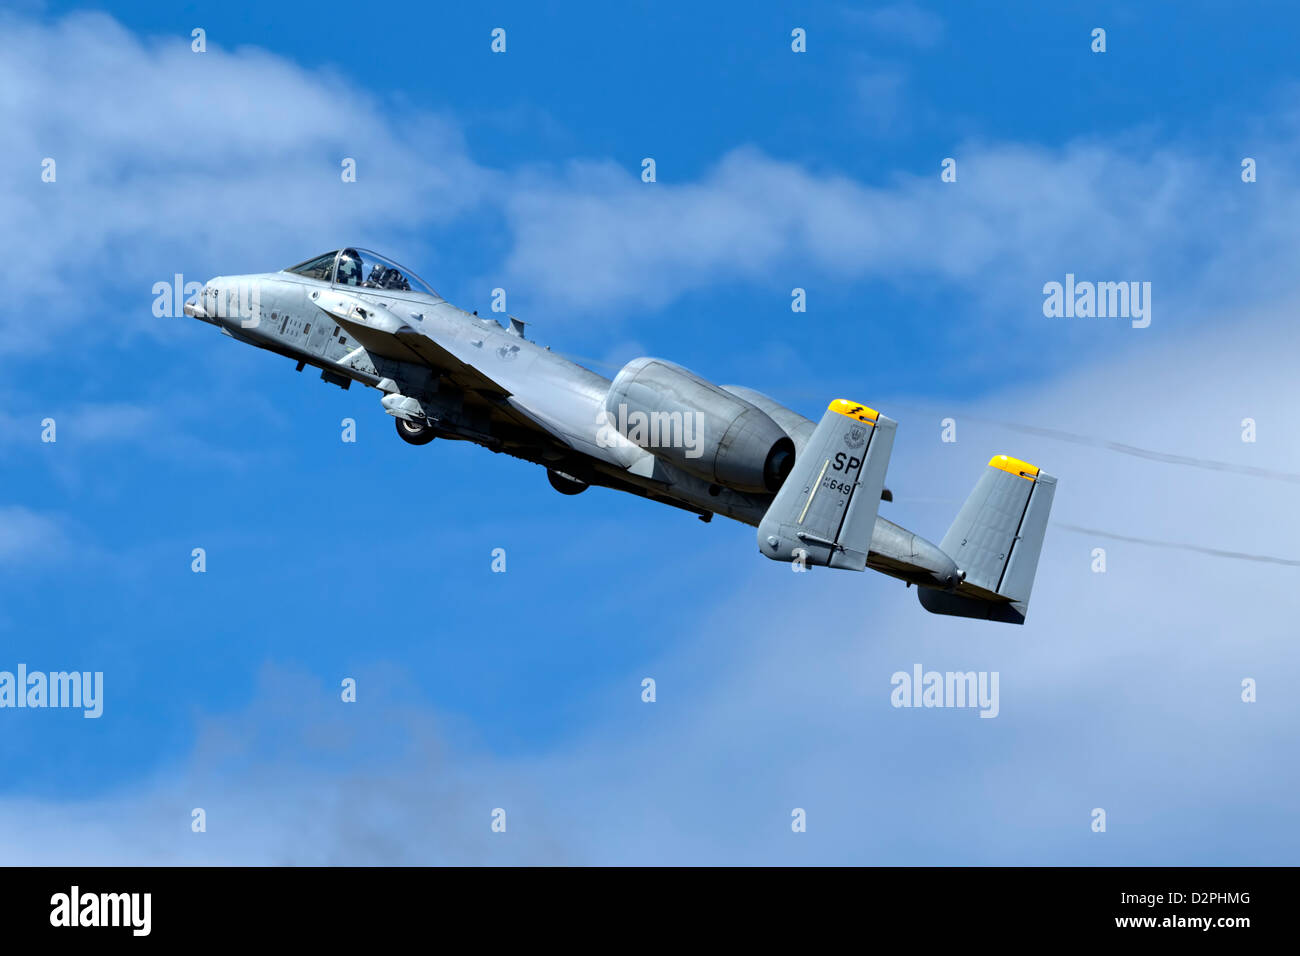 A USAF Fairchild Republic A10 Thunderbolt II Warthog ground attack aircraft - Stock Image